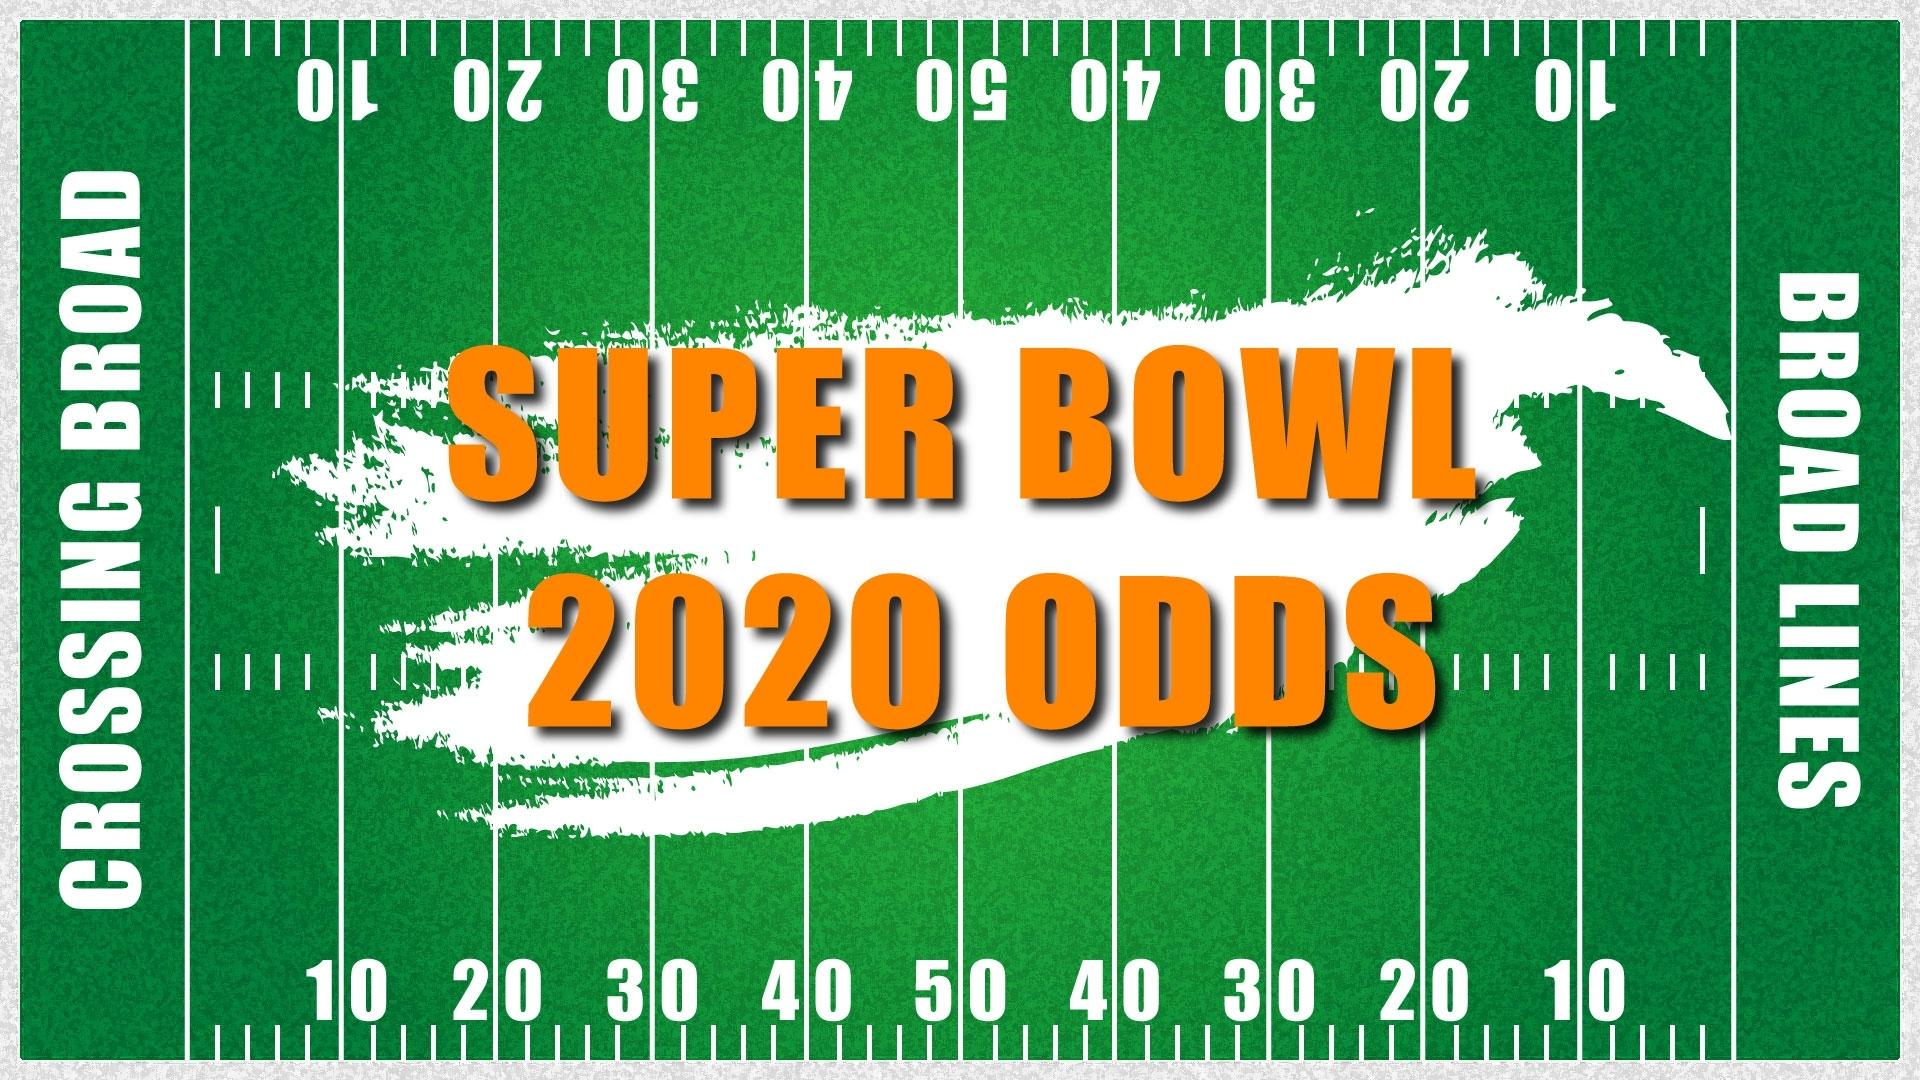 2020 Super Bowl Odds | Odds To Win Super Bowl 54 | Crossing regarding Miami Dolphins Super Bowl Odds 2019